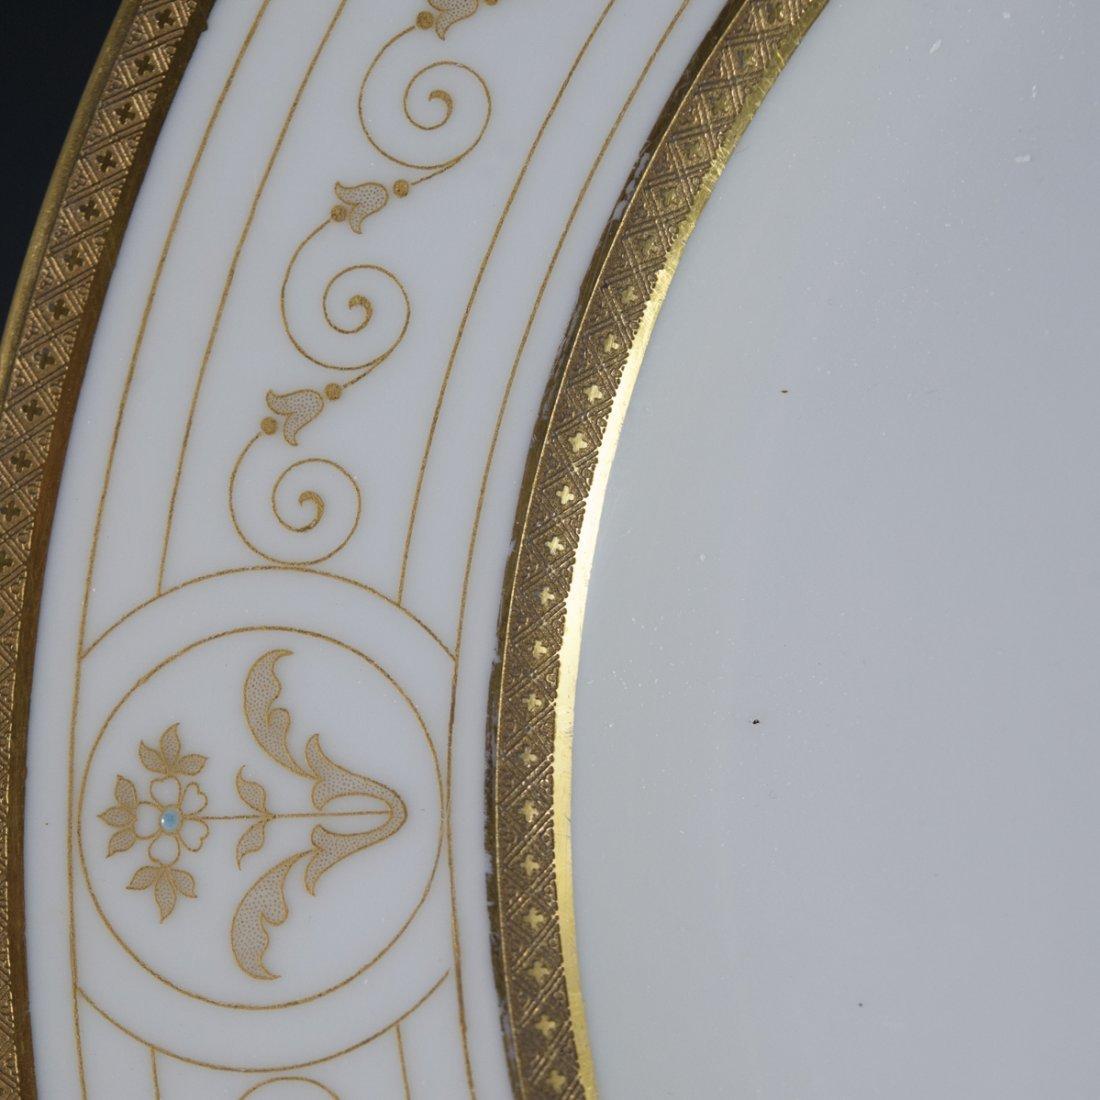 Rosenthal Continental Gilded & Enameled Dinner Plates - 6